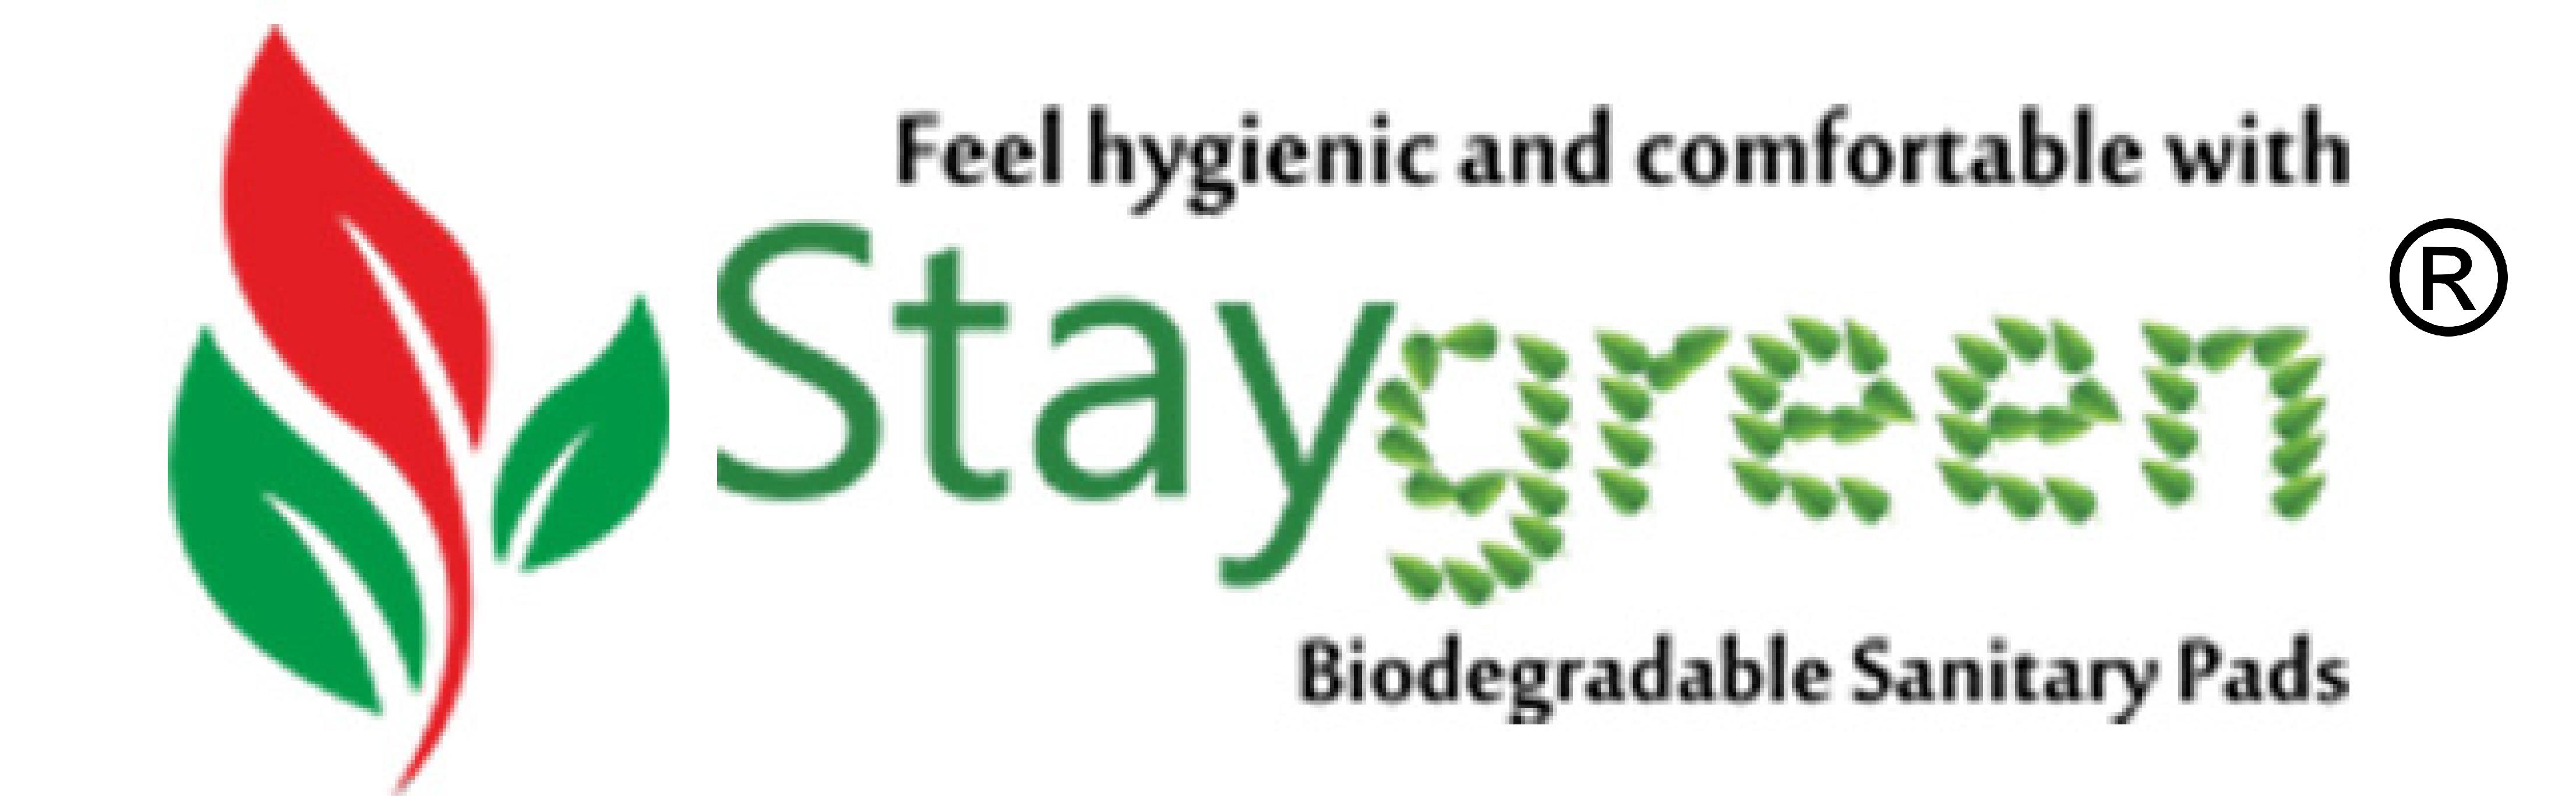 Staygreen_r_logo